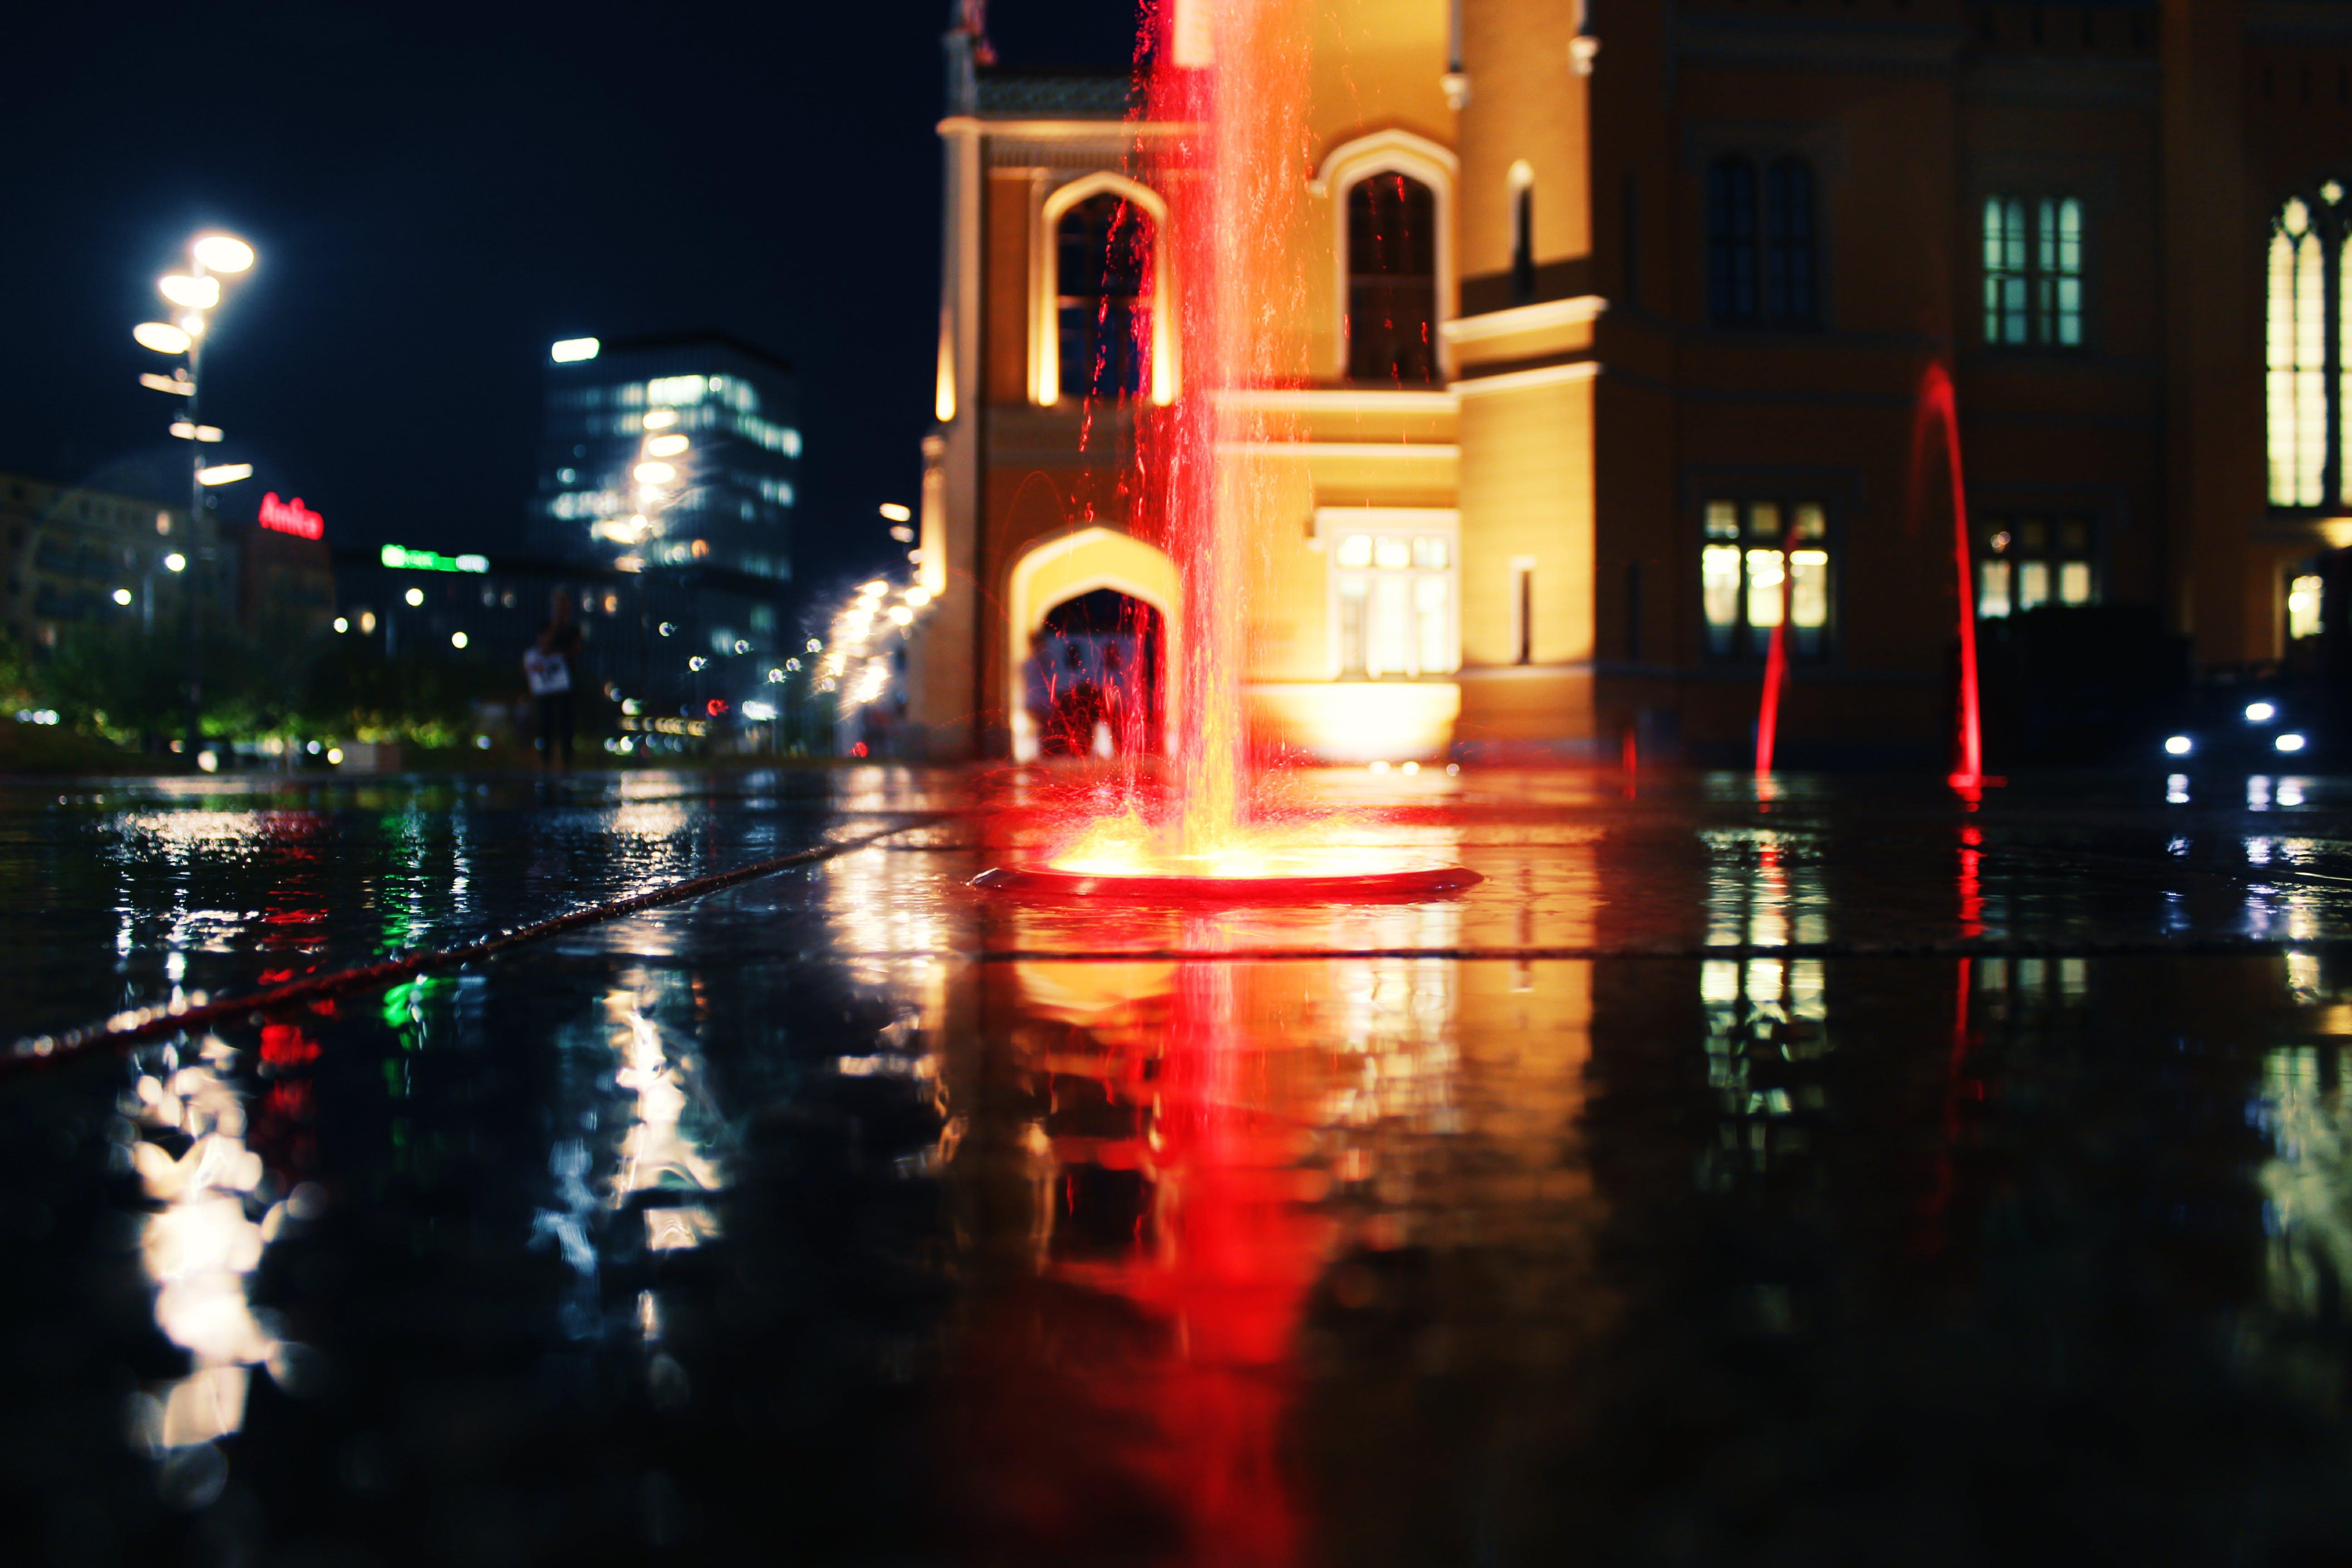 Light Fountain on Road